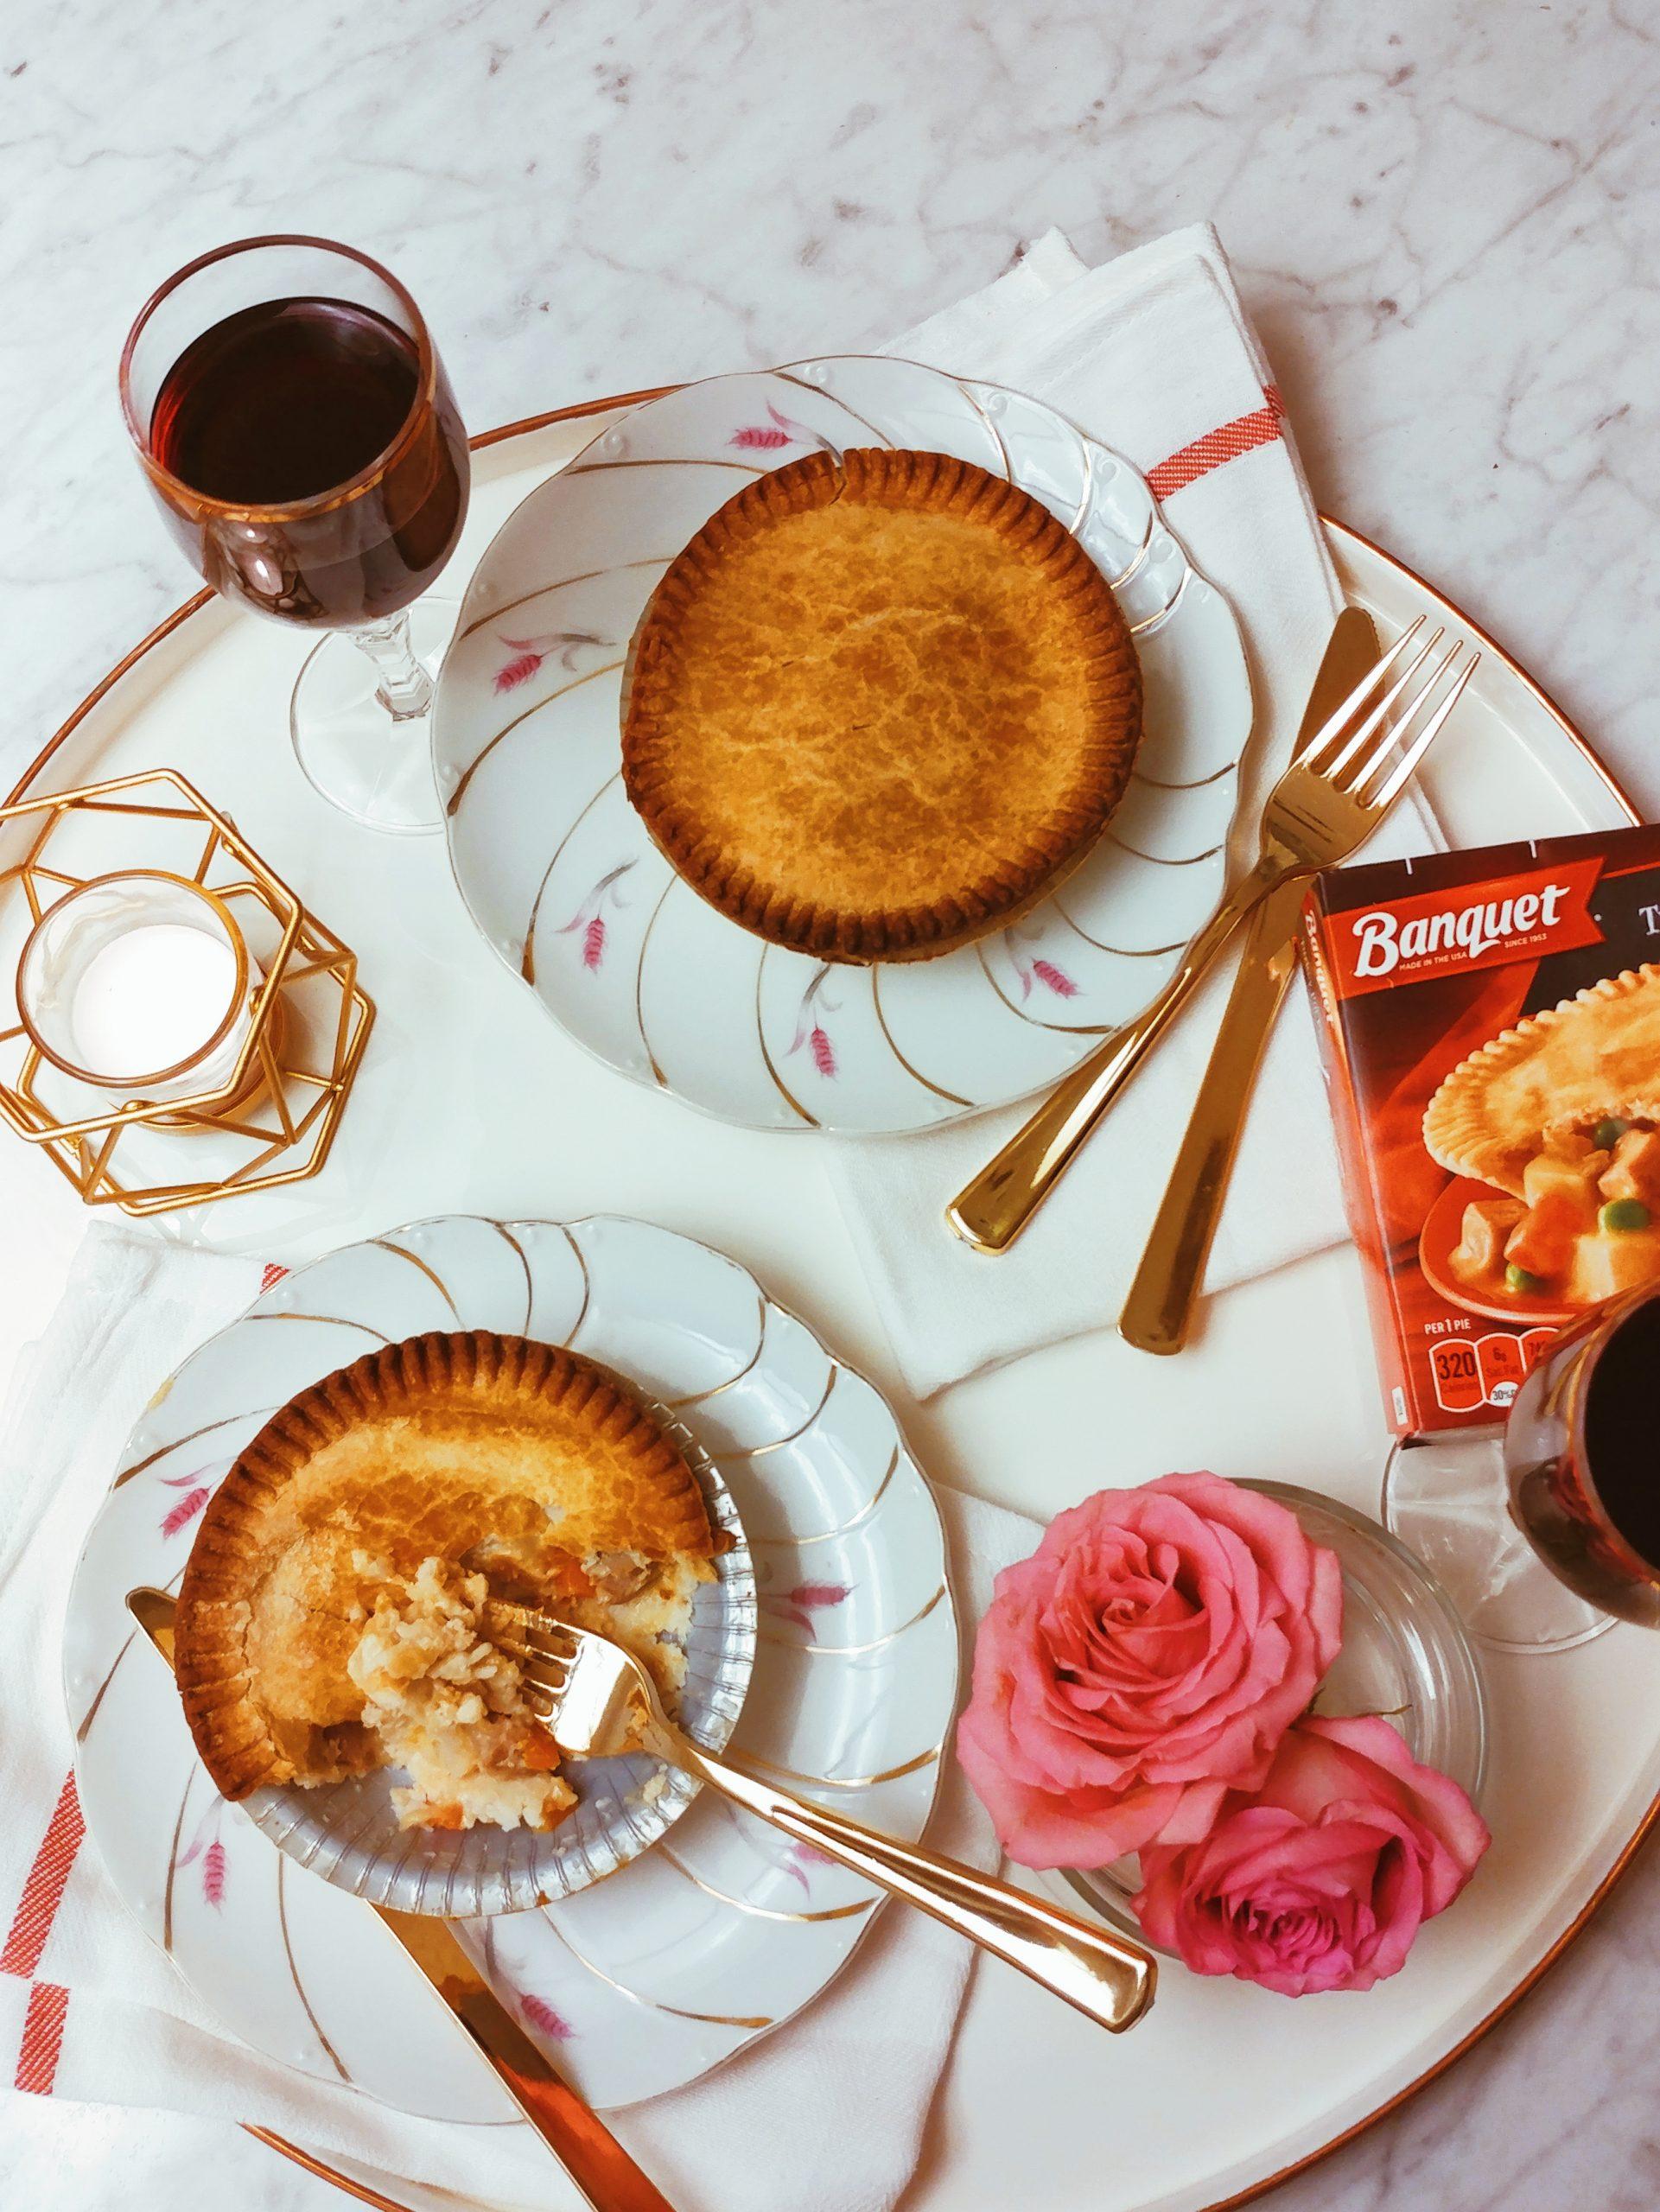 Banquet Food x Always Creating Blog